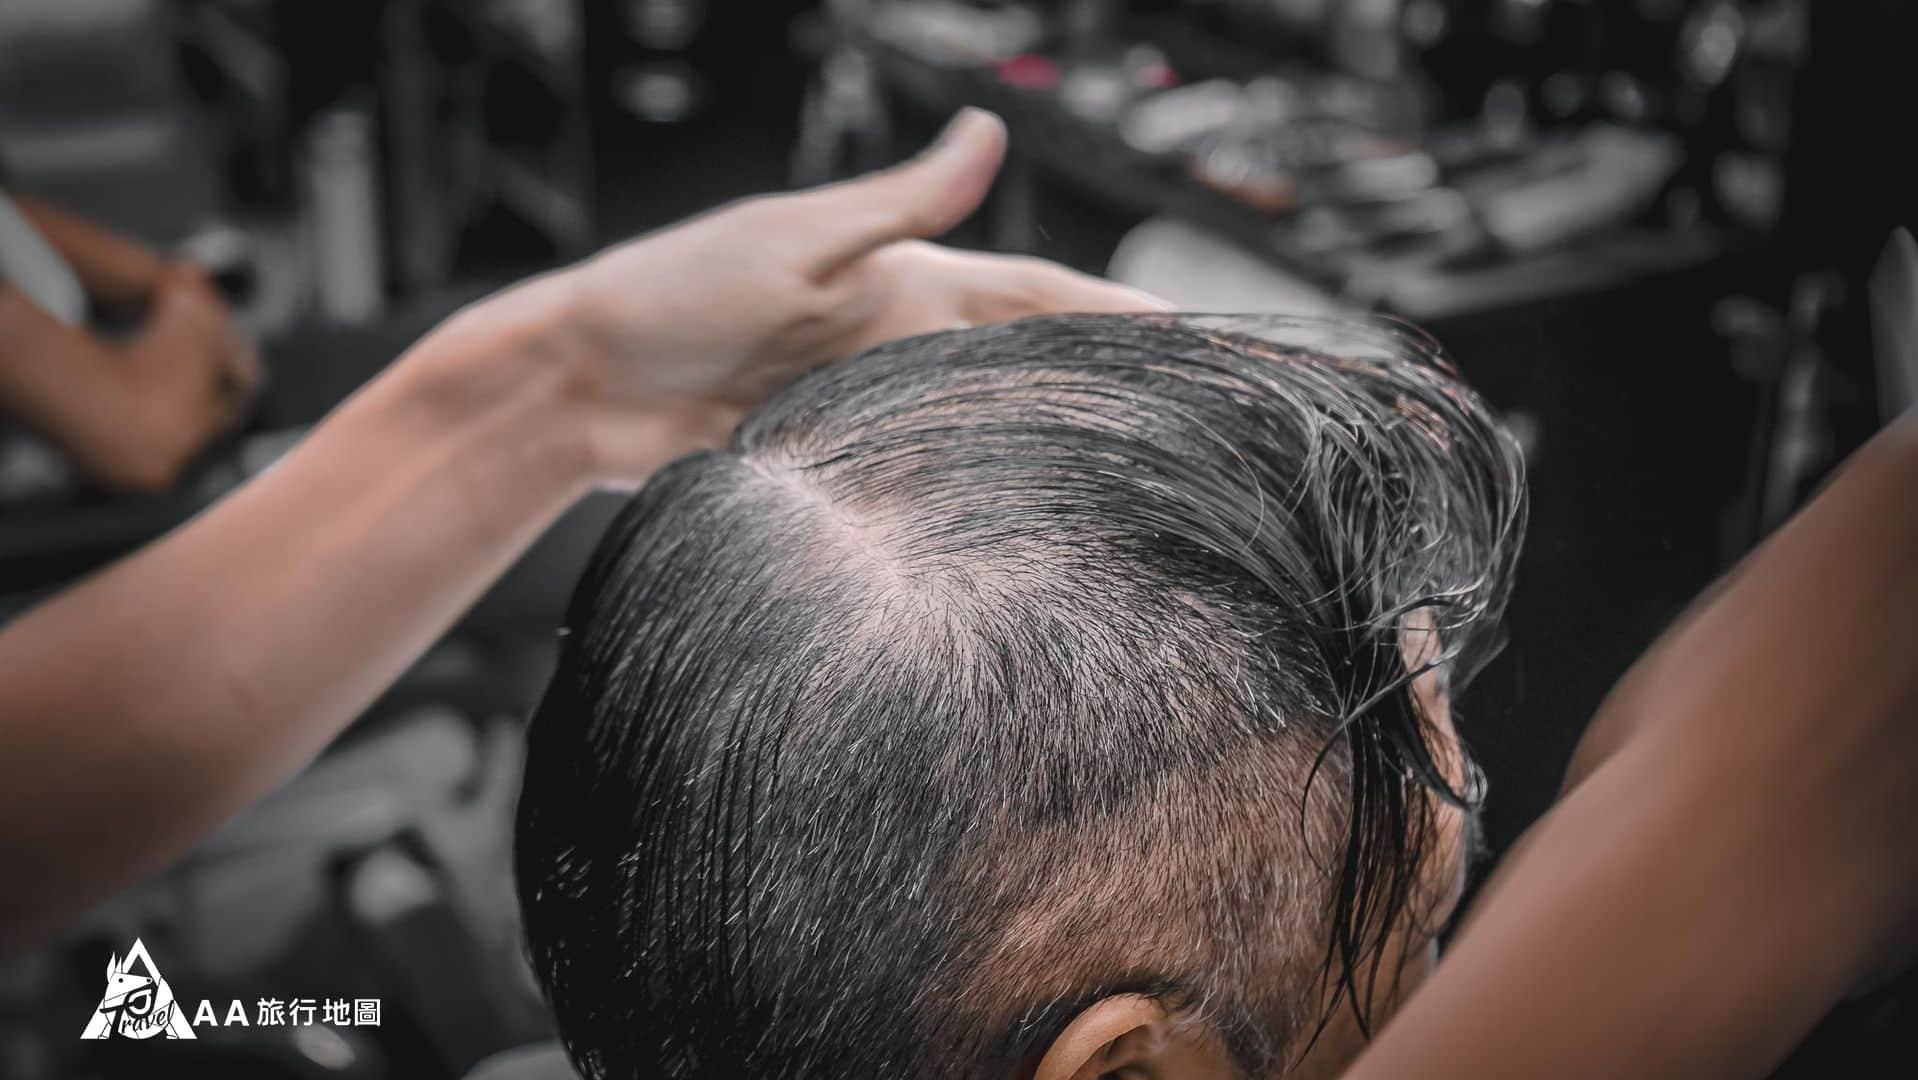 HomeComing 理髮前先把髮流確定好,很少去理髮的時候會有人這樣做